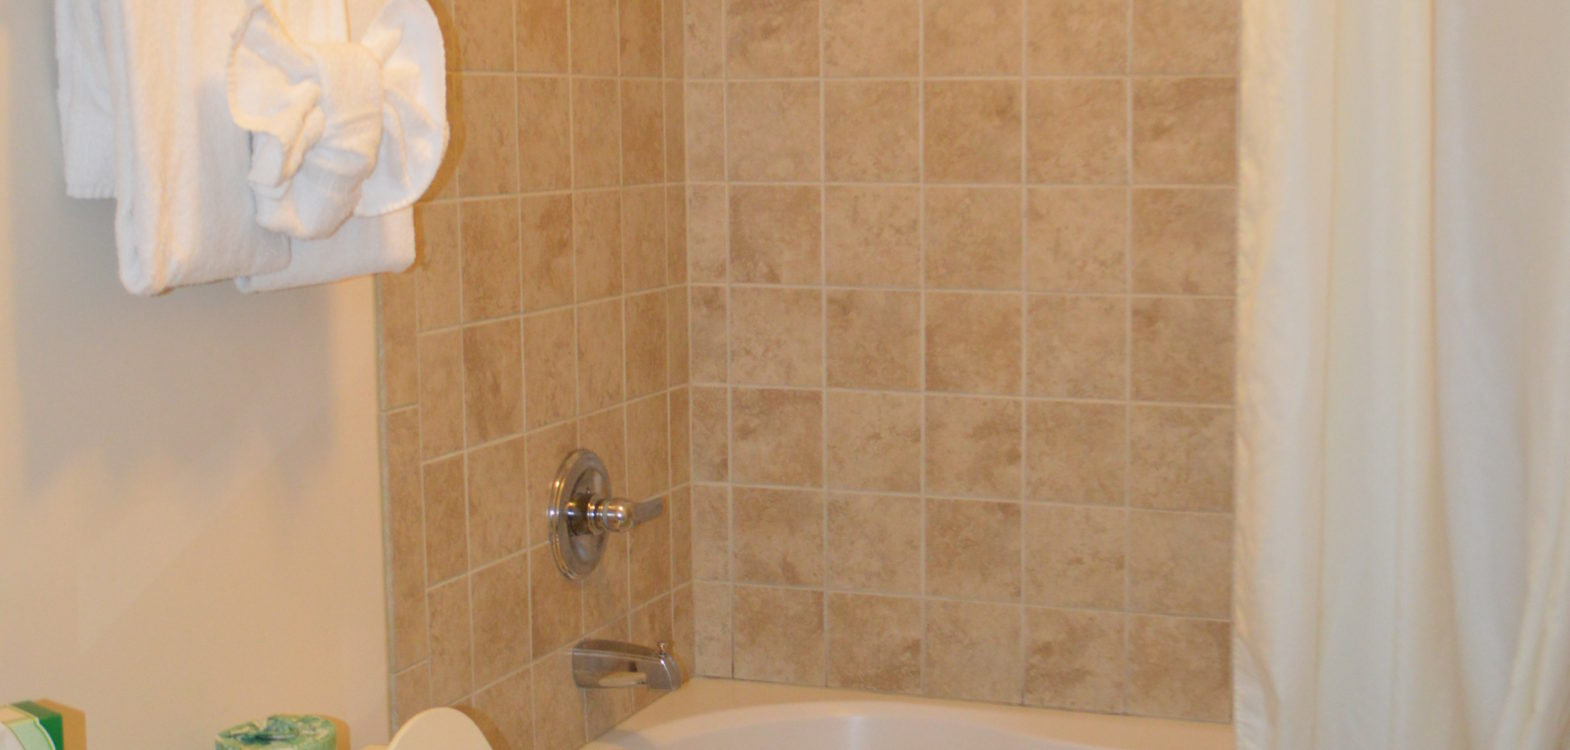 Deluxe Jacuzzi Bath